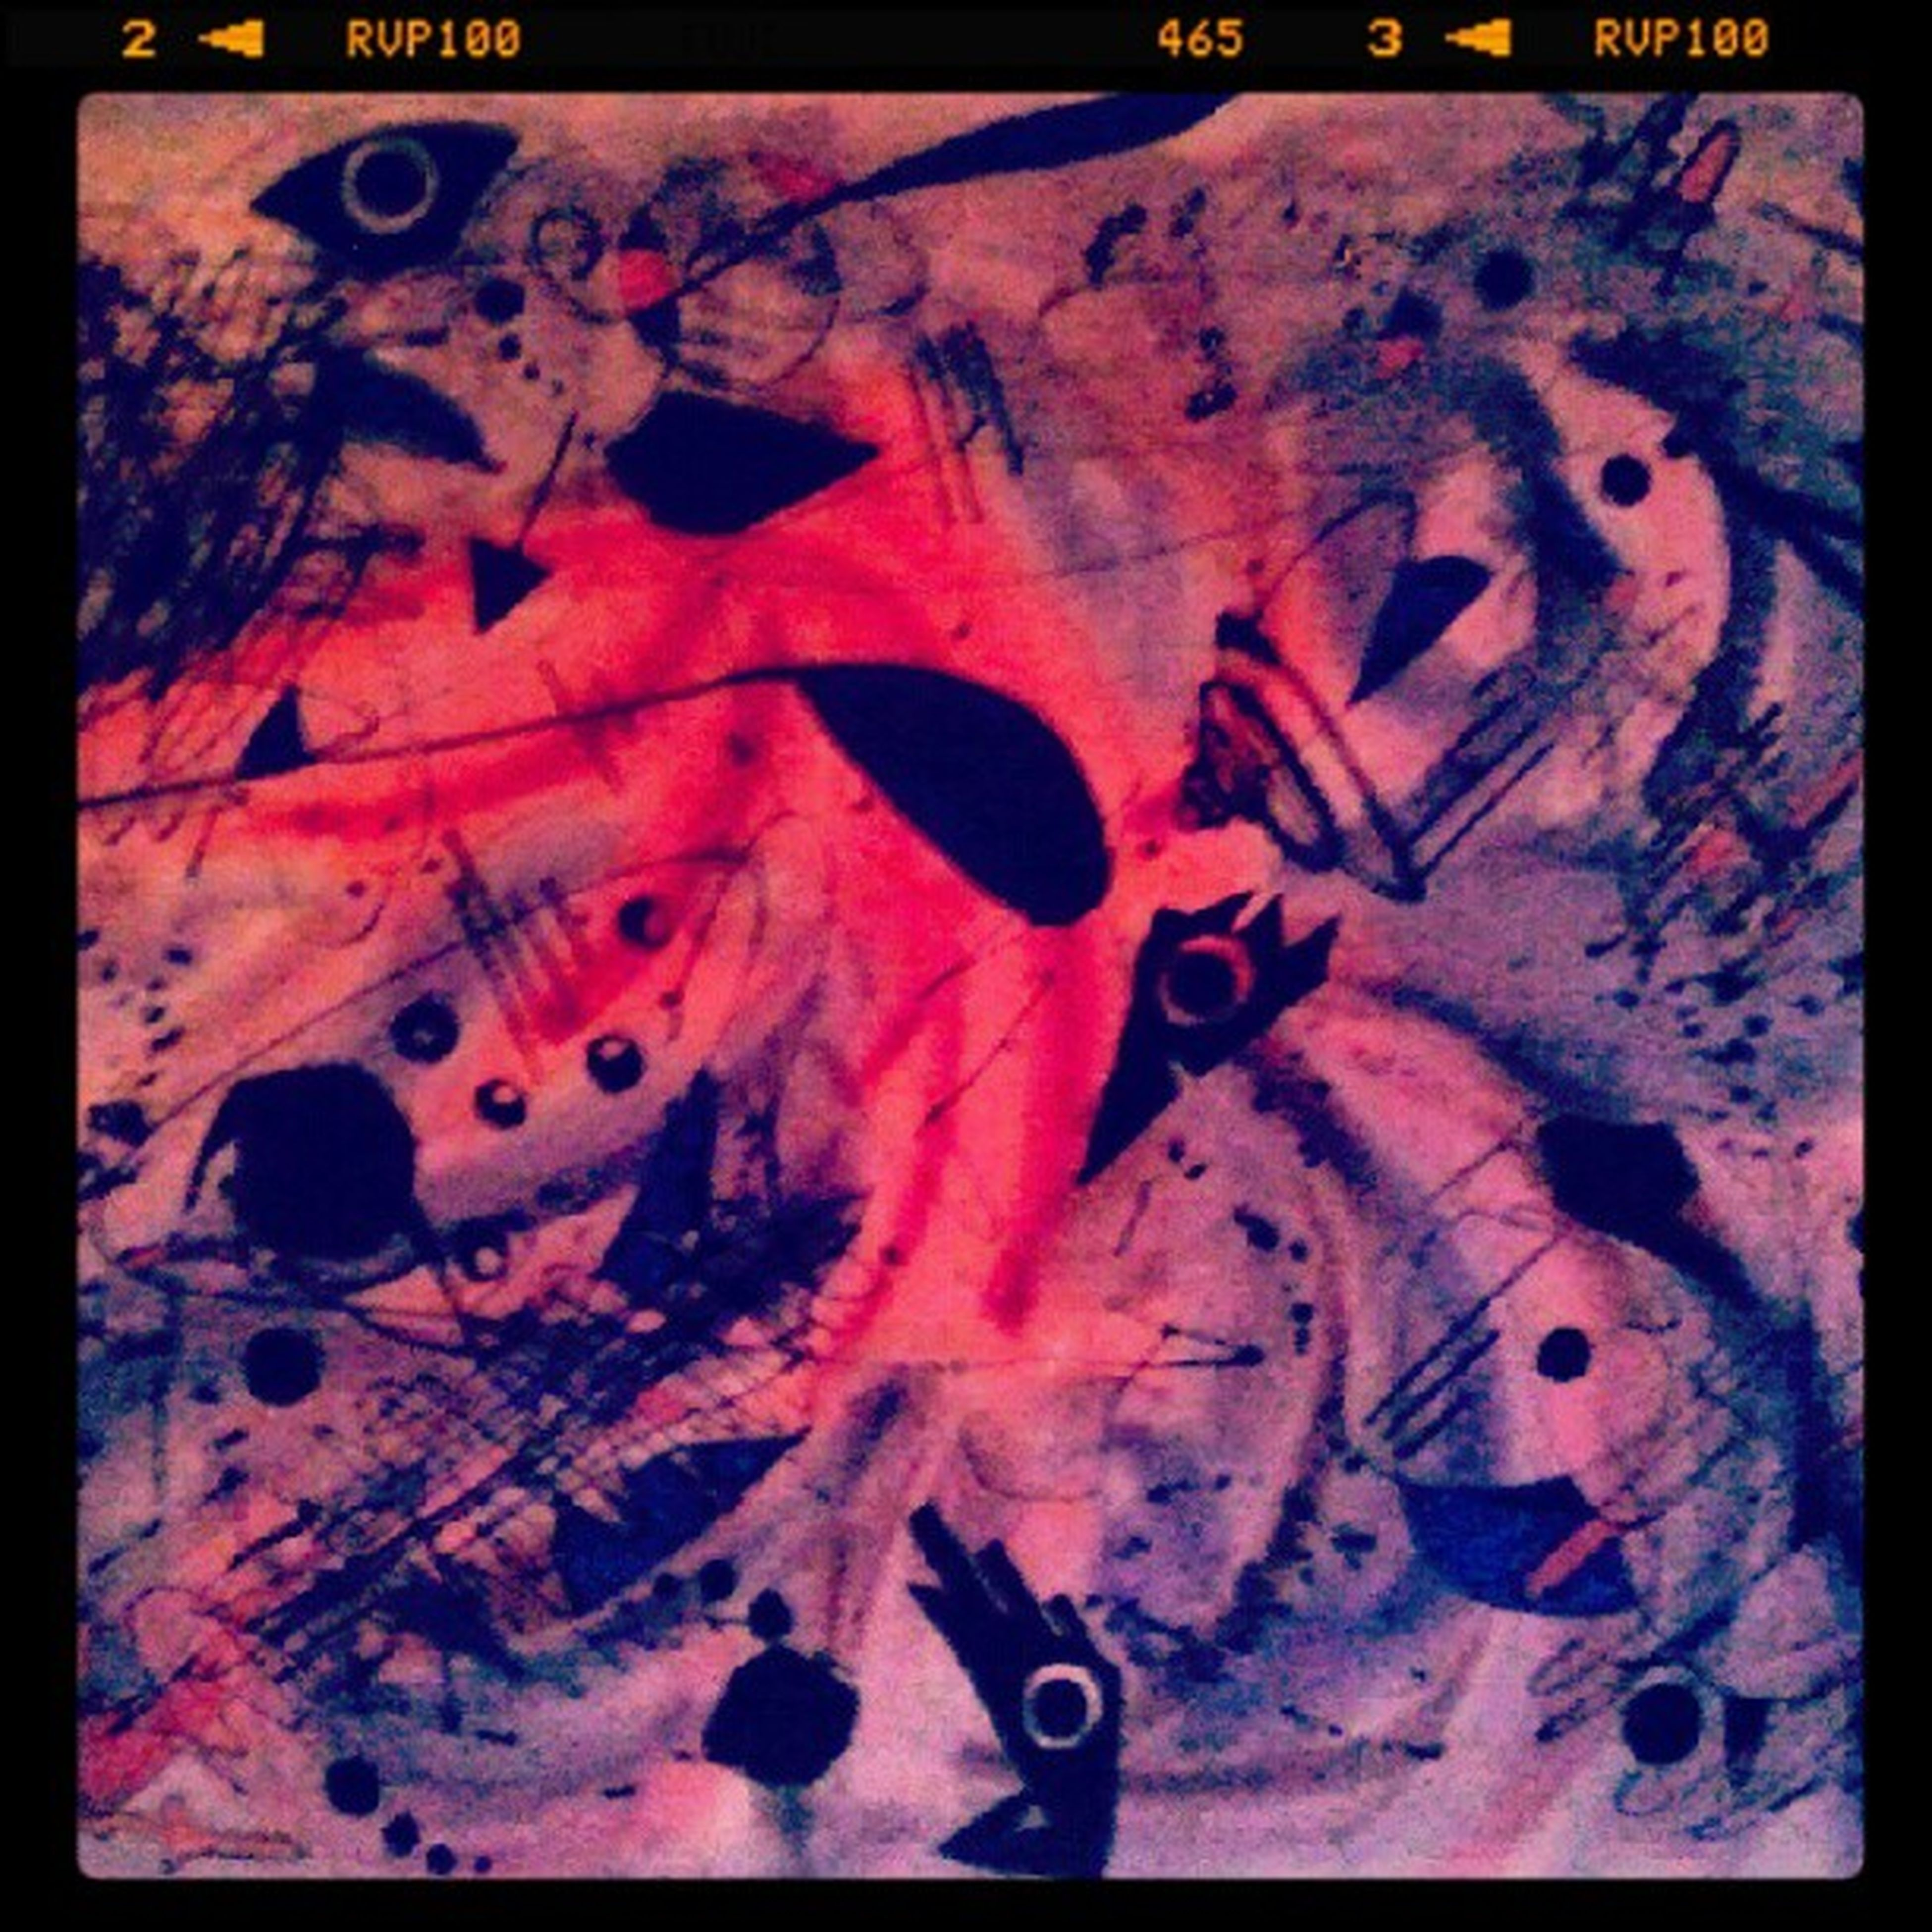 creativity, art and craft, art, transfer print, text, graffiti, auto post production filter, human representation, western script, communication, animal representation, close-up, wall - building feature, love, heart shape, full frame, ideas, no people, street art